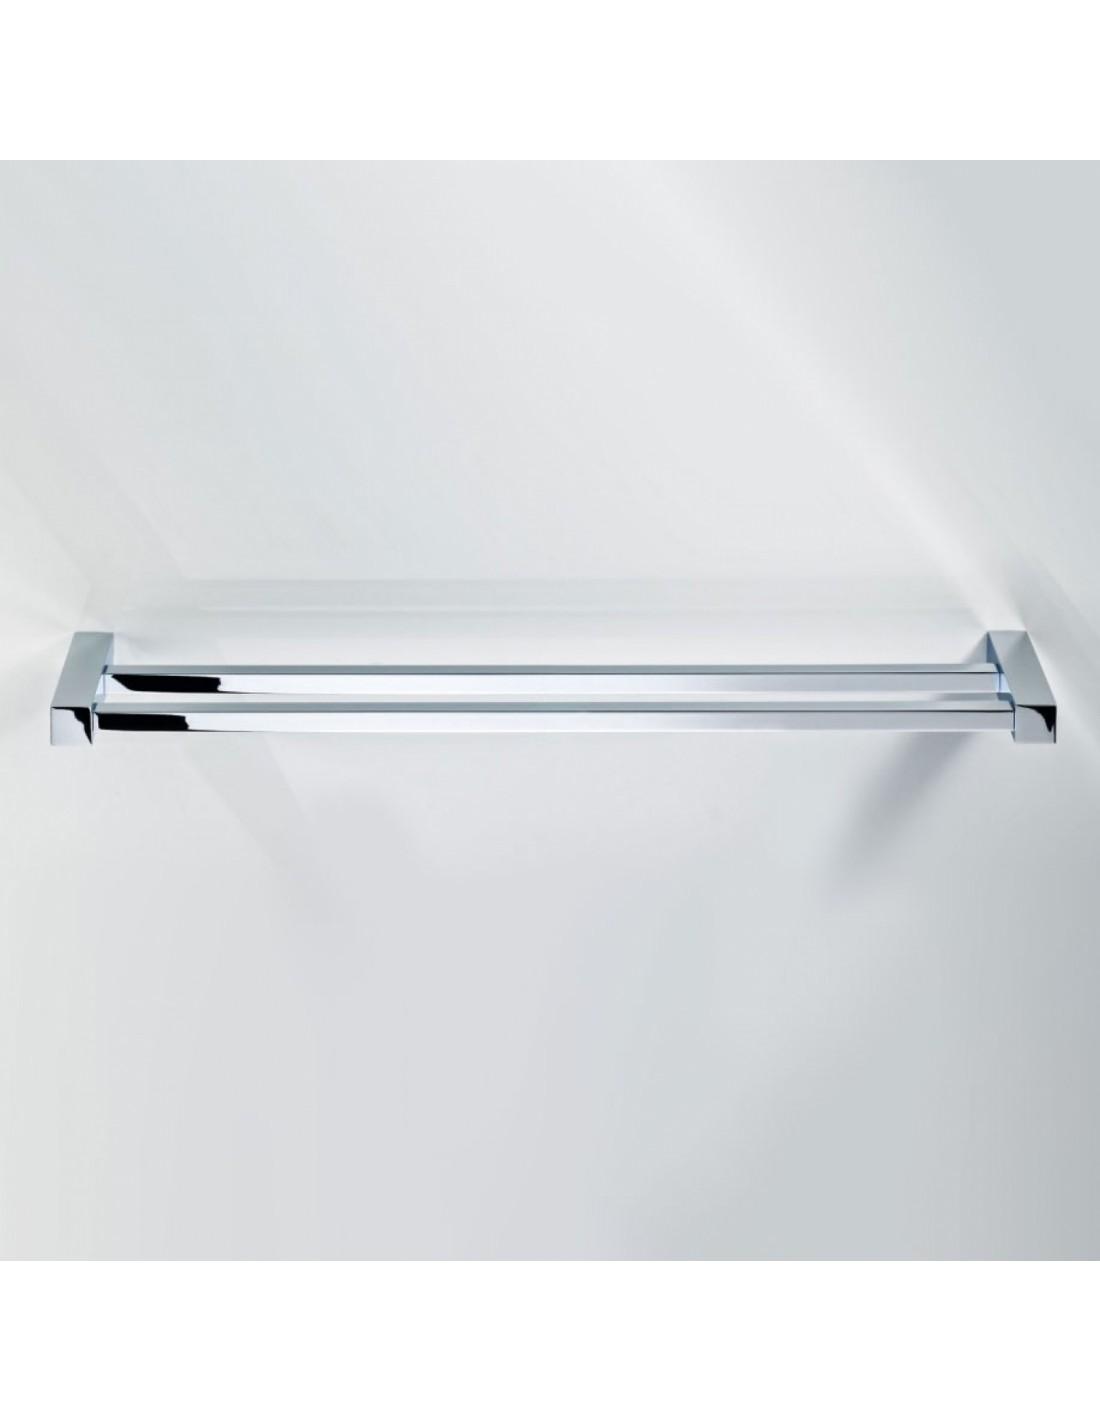 Porte serviette double 60 cm corner for Porte serviette double